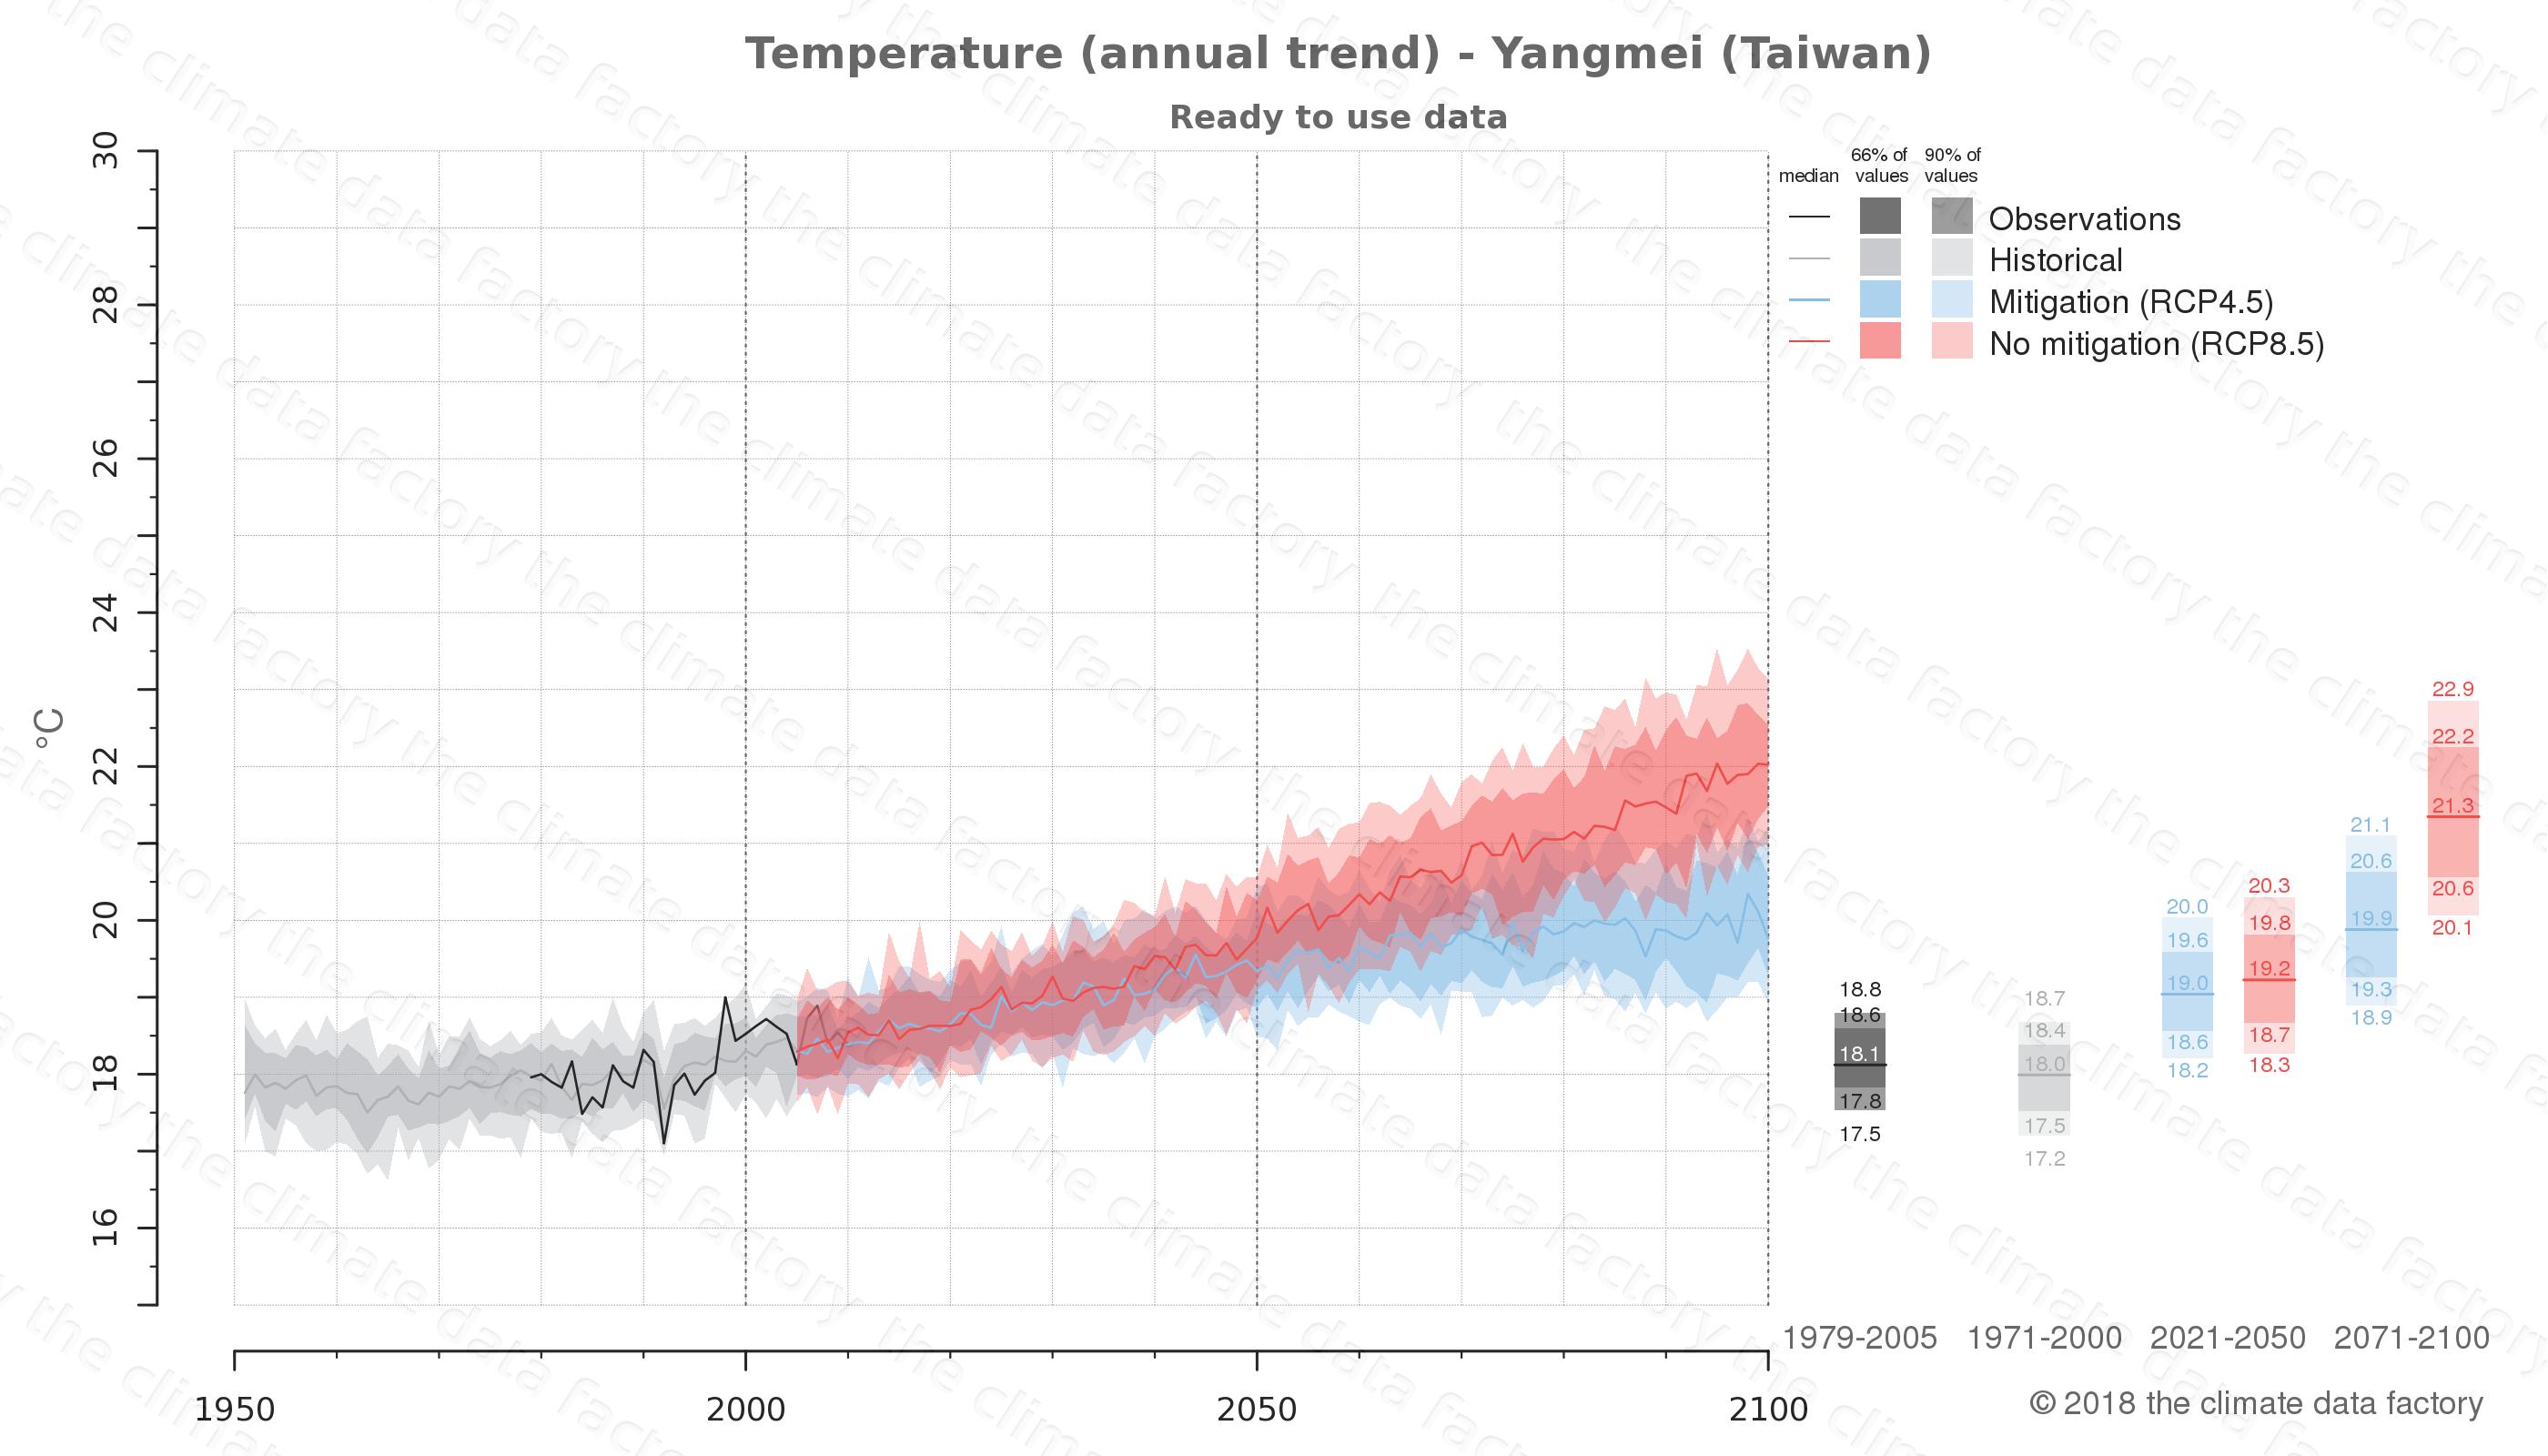 climate change data policy adaptation climate graph city data temperature yangmei taiwan